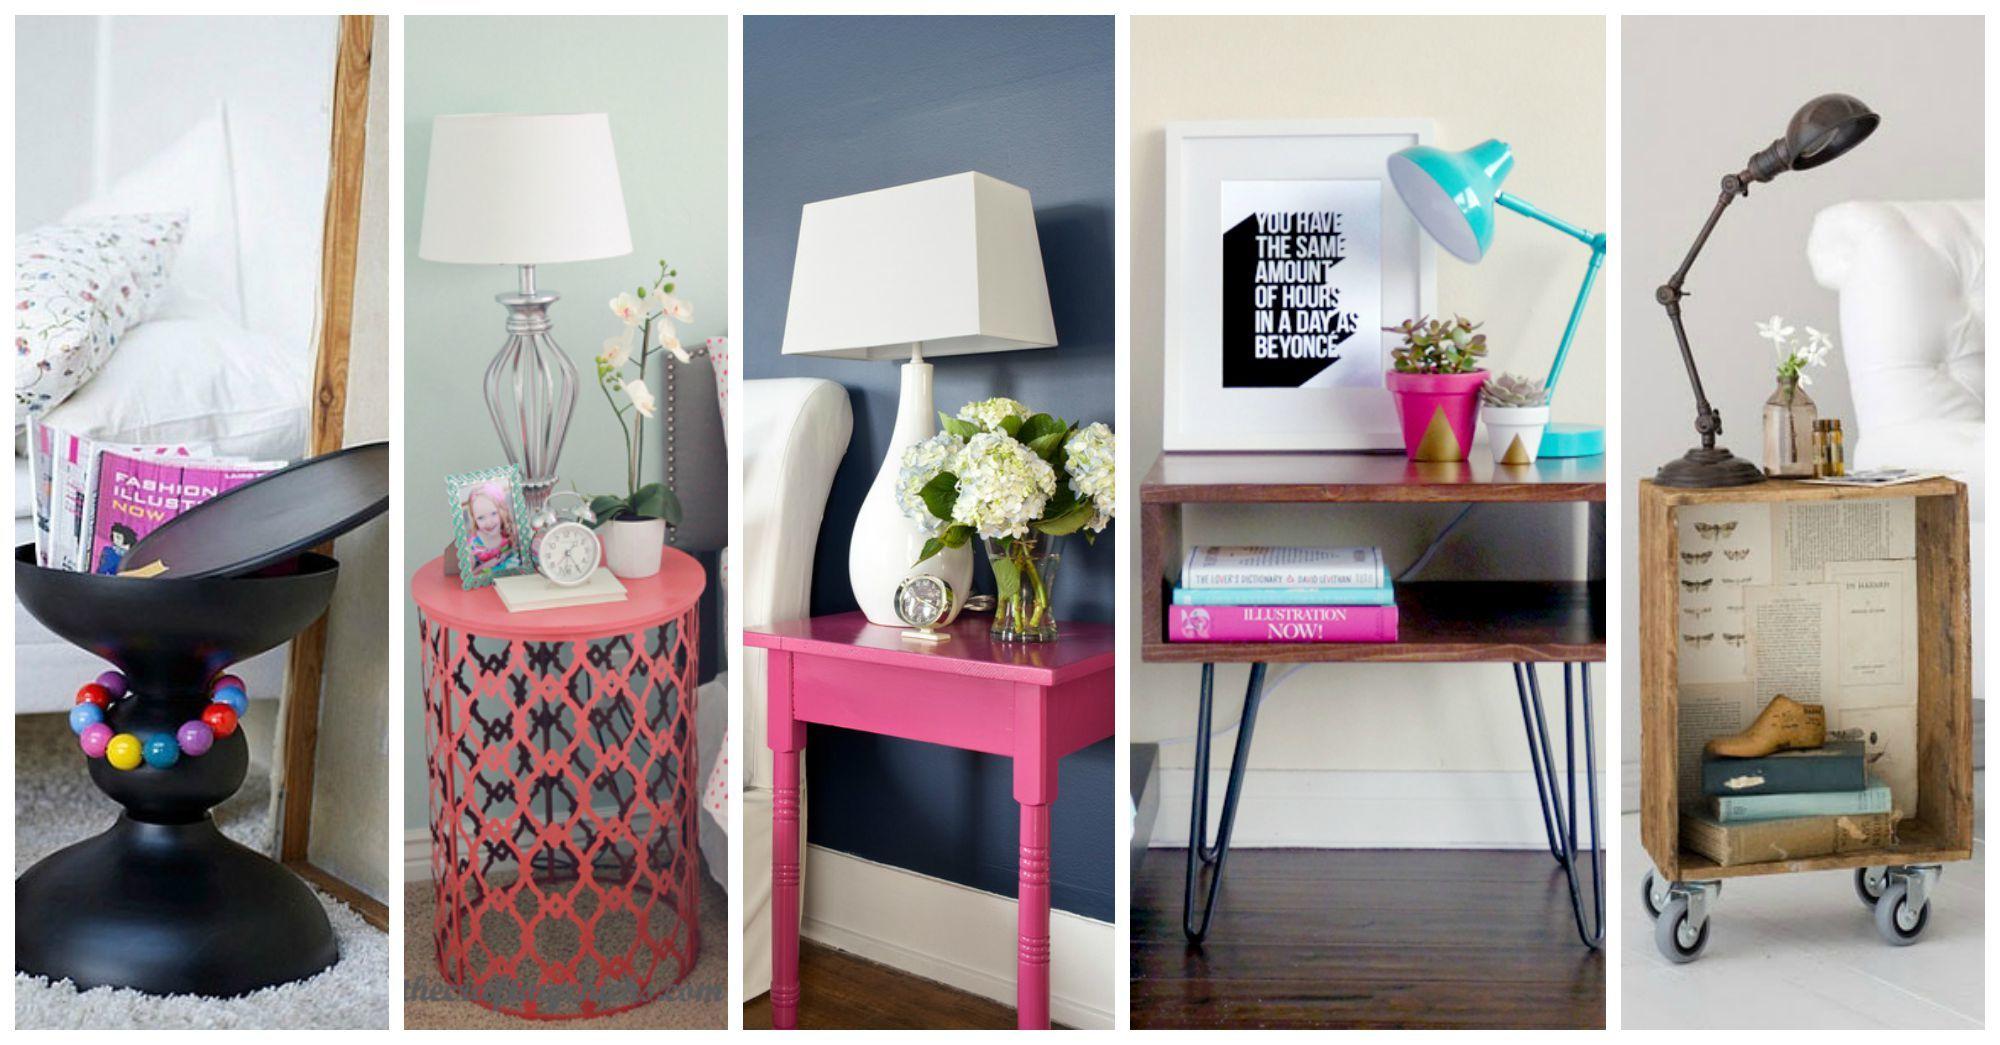 15 Amazing Ways To Beautify Your Bedroom With Nightstands